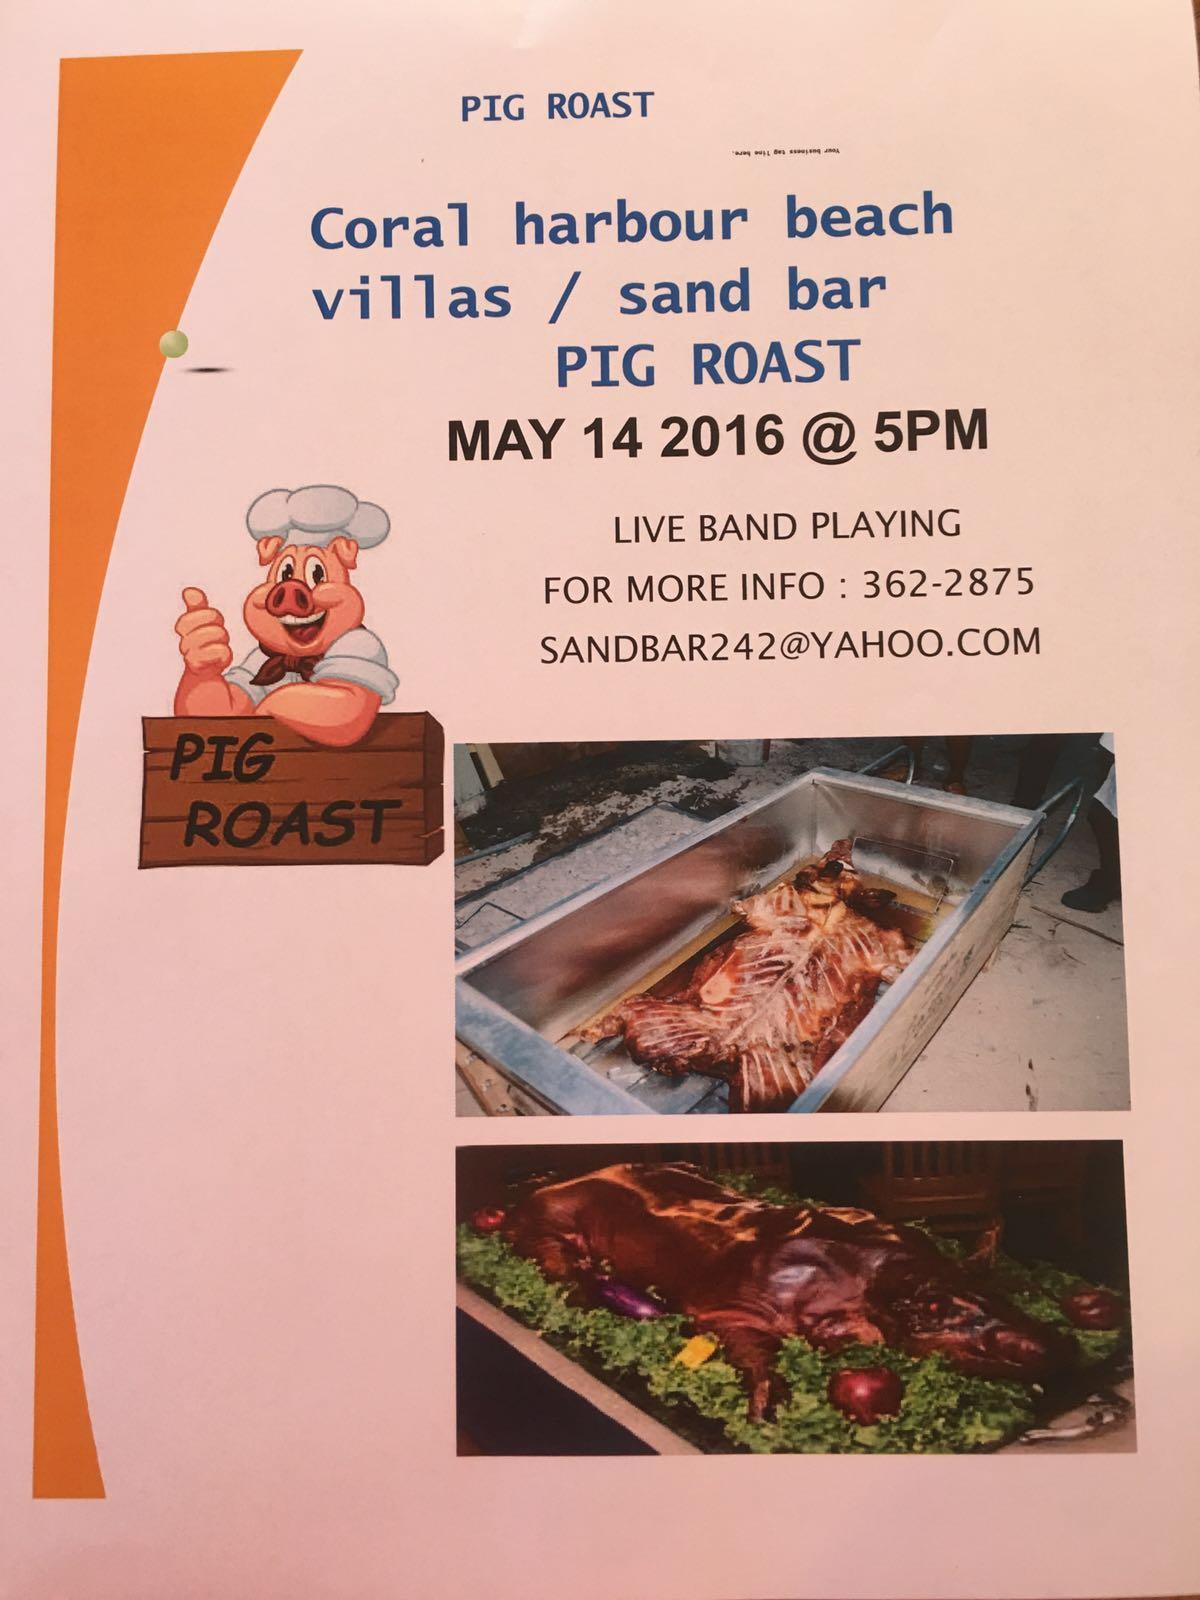 Pig Roast @ Coral Harbour Beach Villas